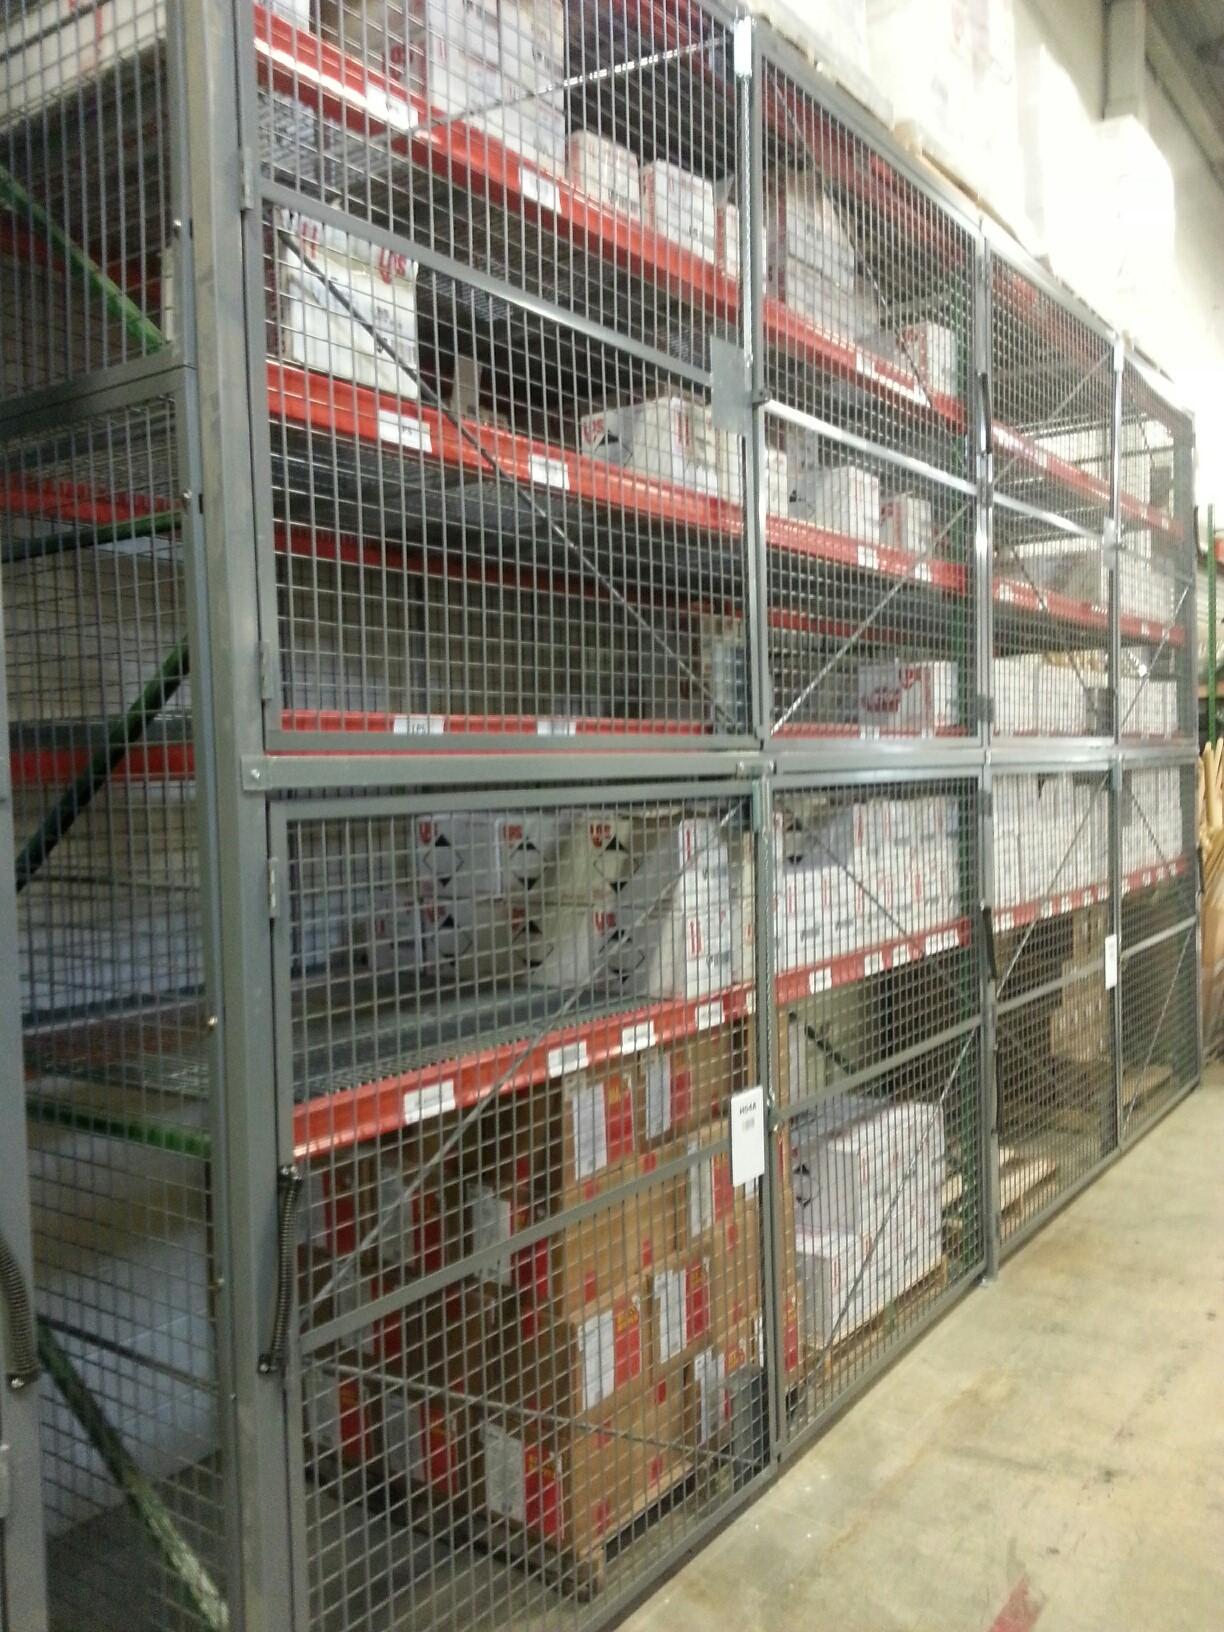 Pallet Rack Cage Door Enclosures Carteret Nj Lockersusa